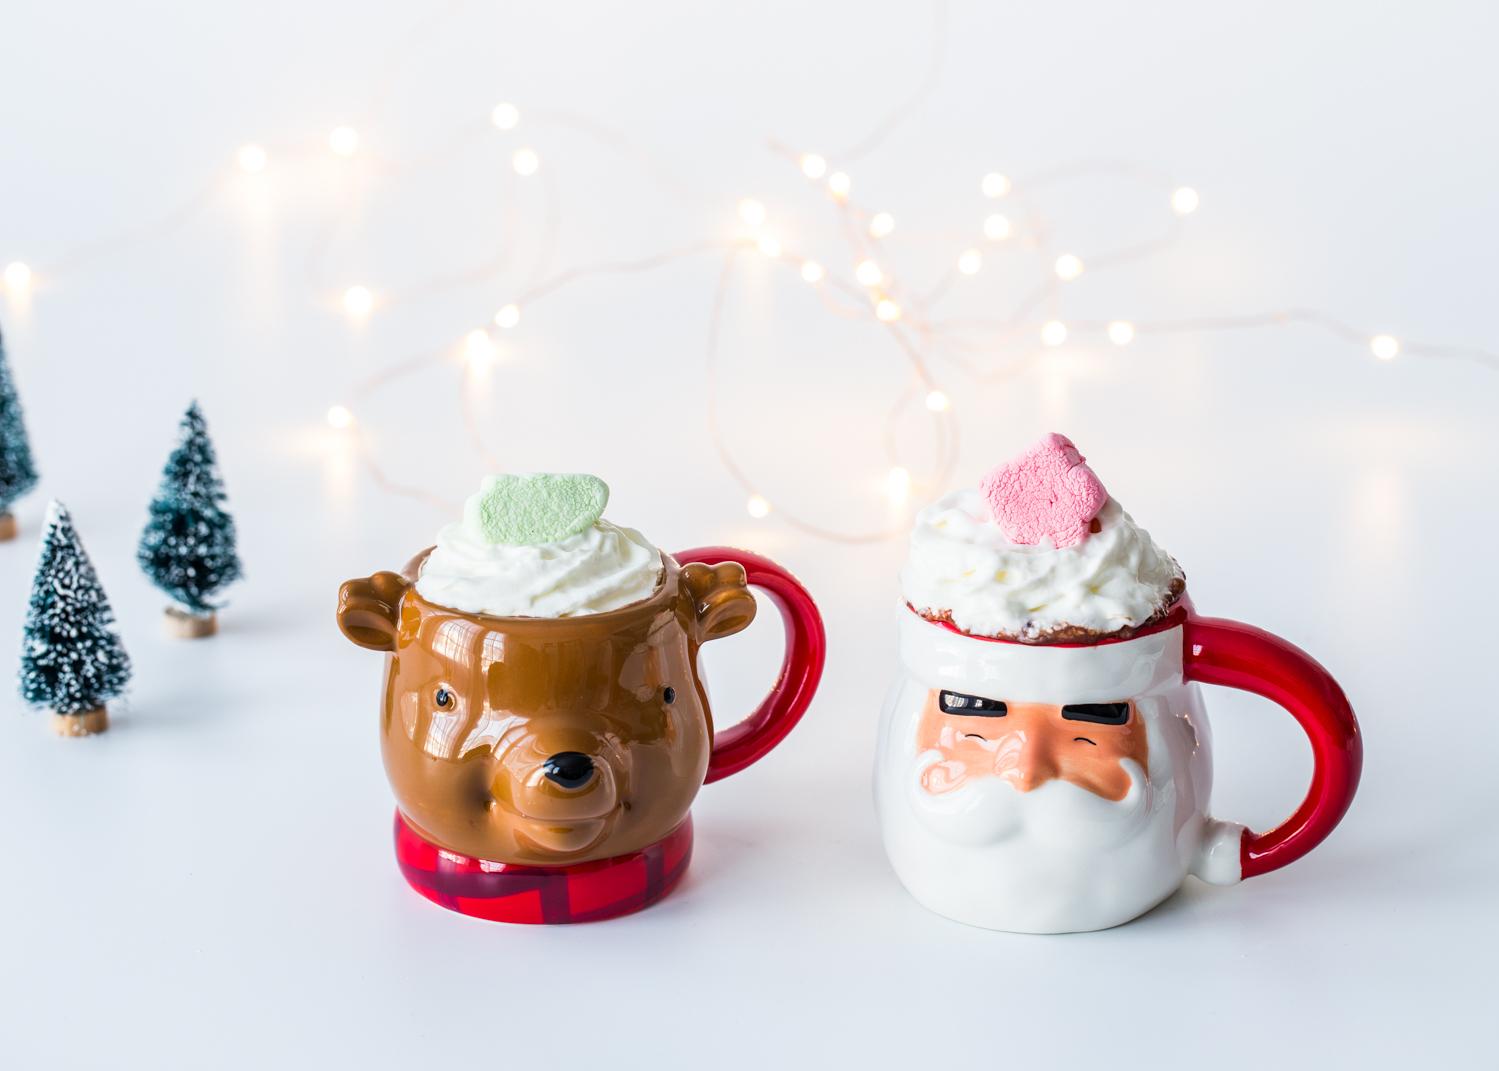 Stovetop Cinnamon Hot Chocolate